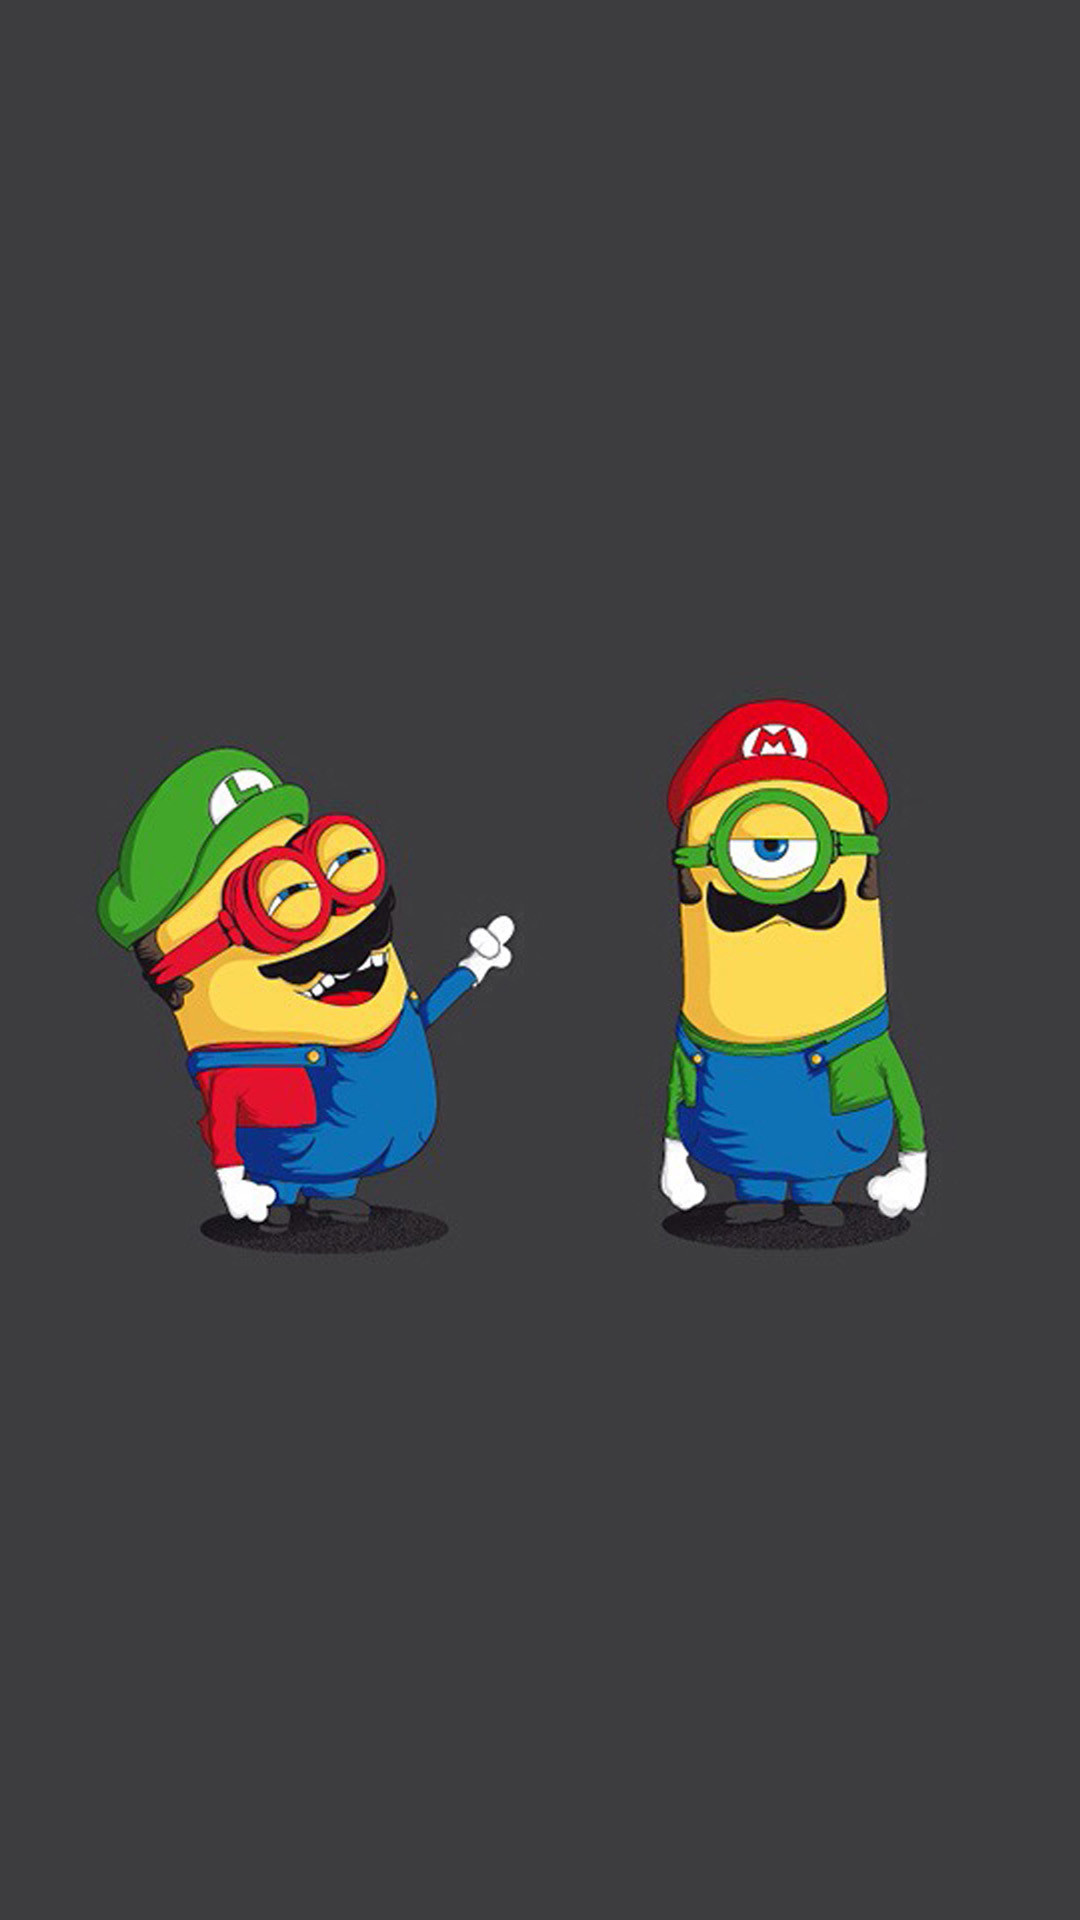 Funny Mario And Luigi Minions HD Wallpaper iPhone 6 plus